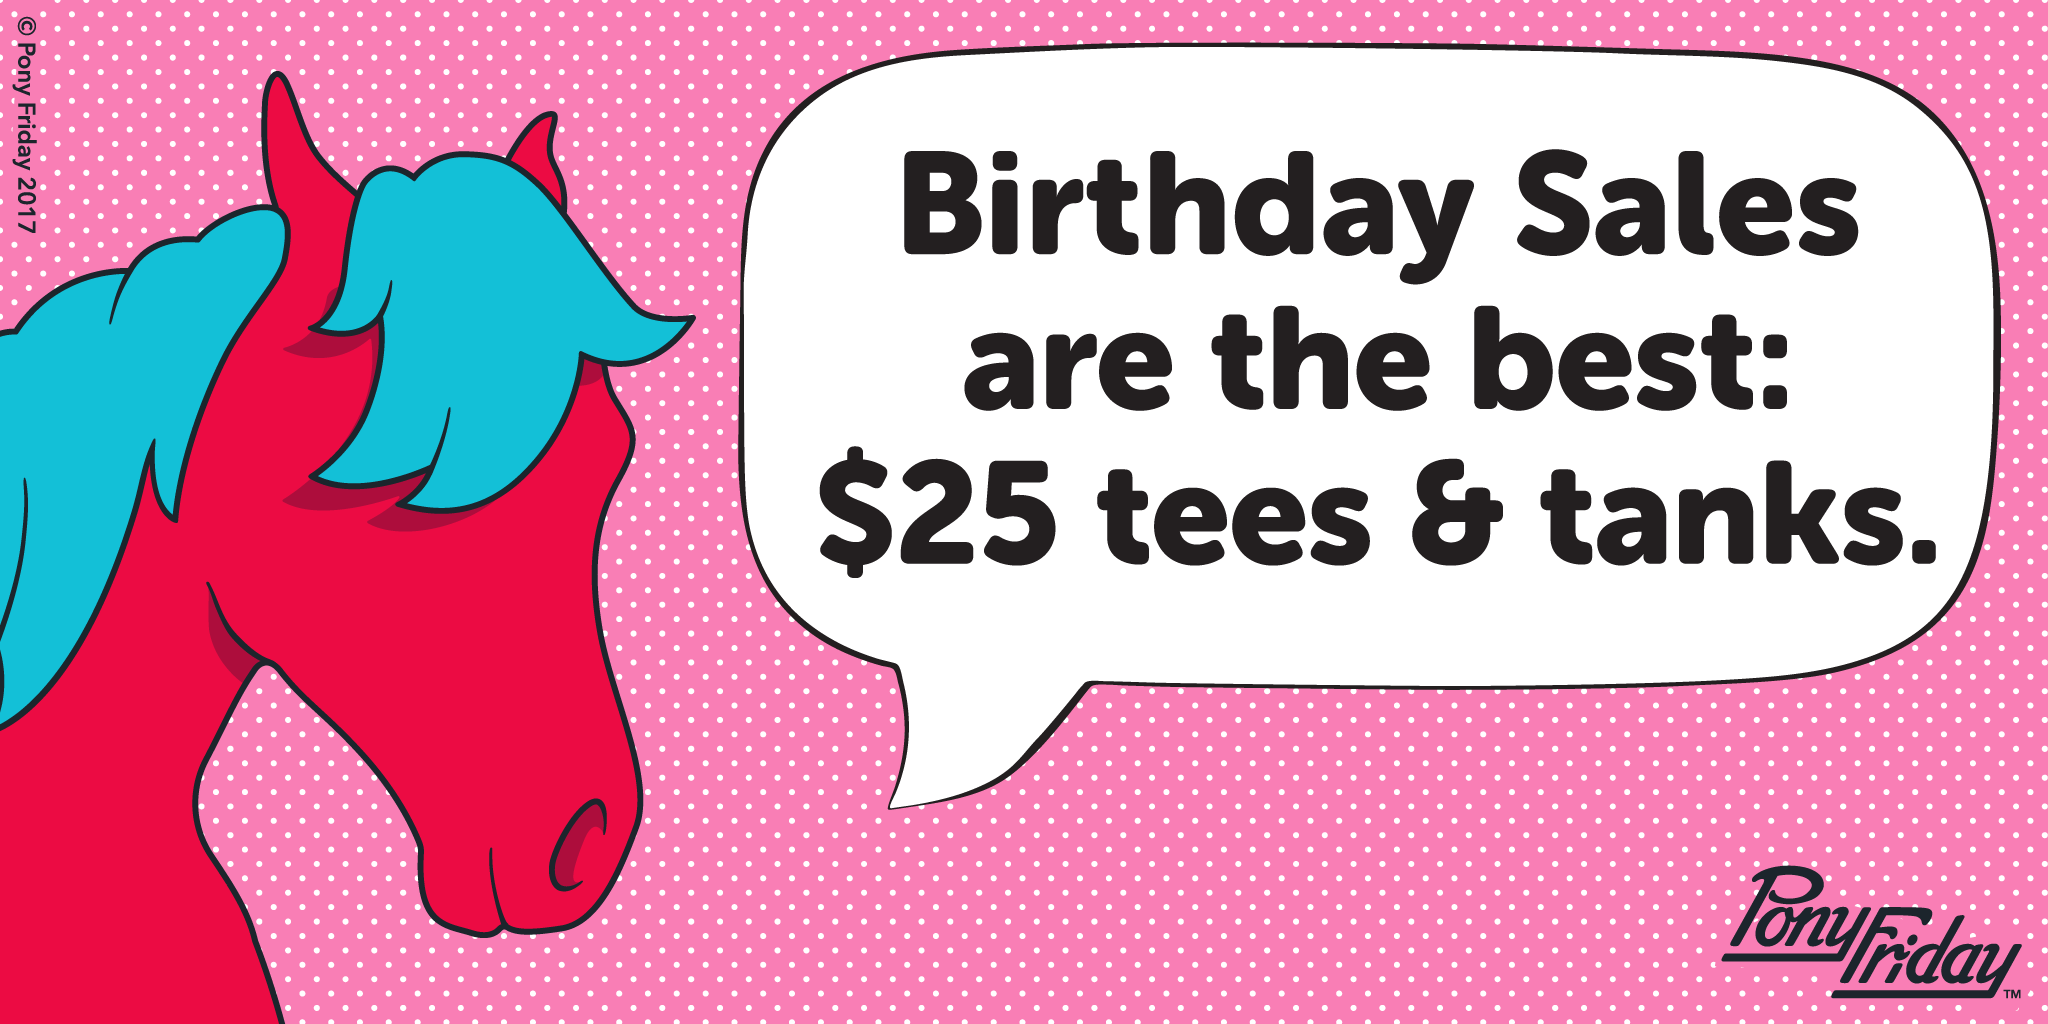 Pony-Friday-Birthday-Sale-Tees-Tanks-Blog-Image.png